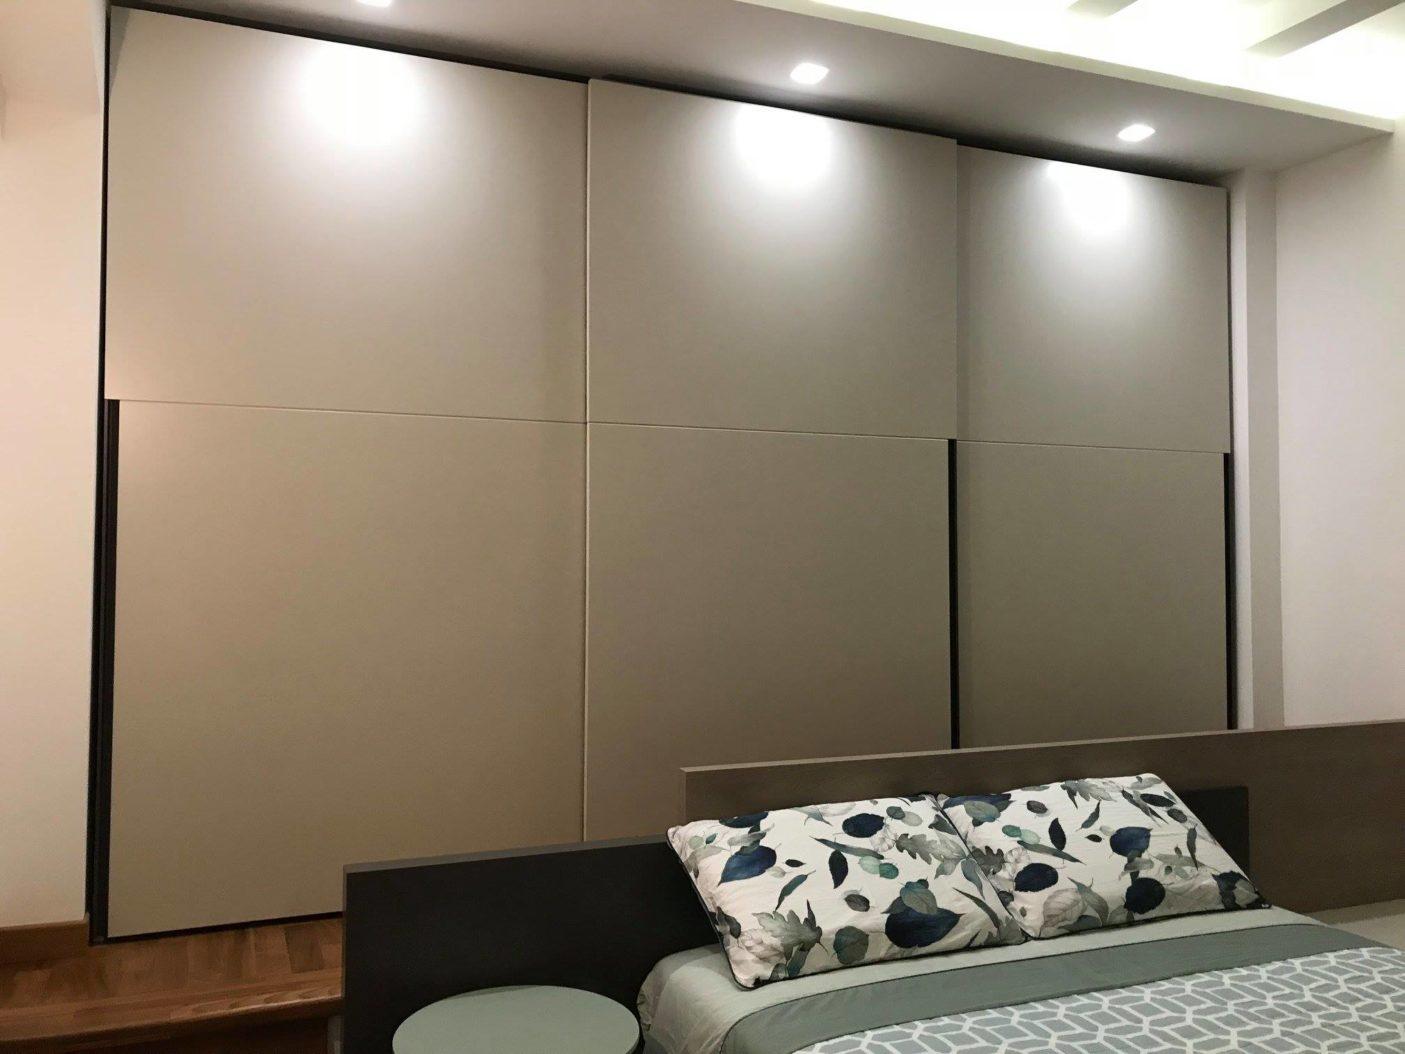 Zona-living-Doimo-salotto-camera-da-letto-Novamobili6.jpg